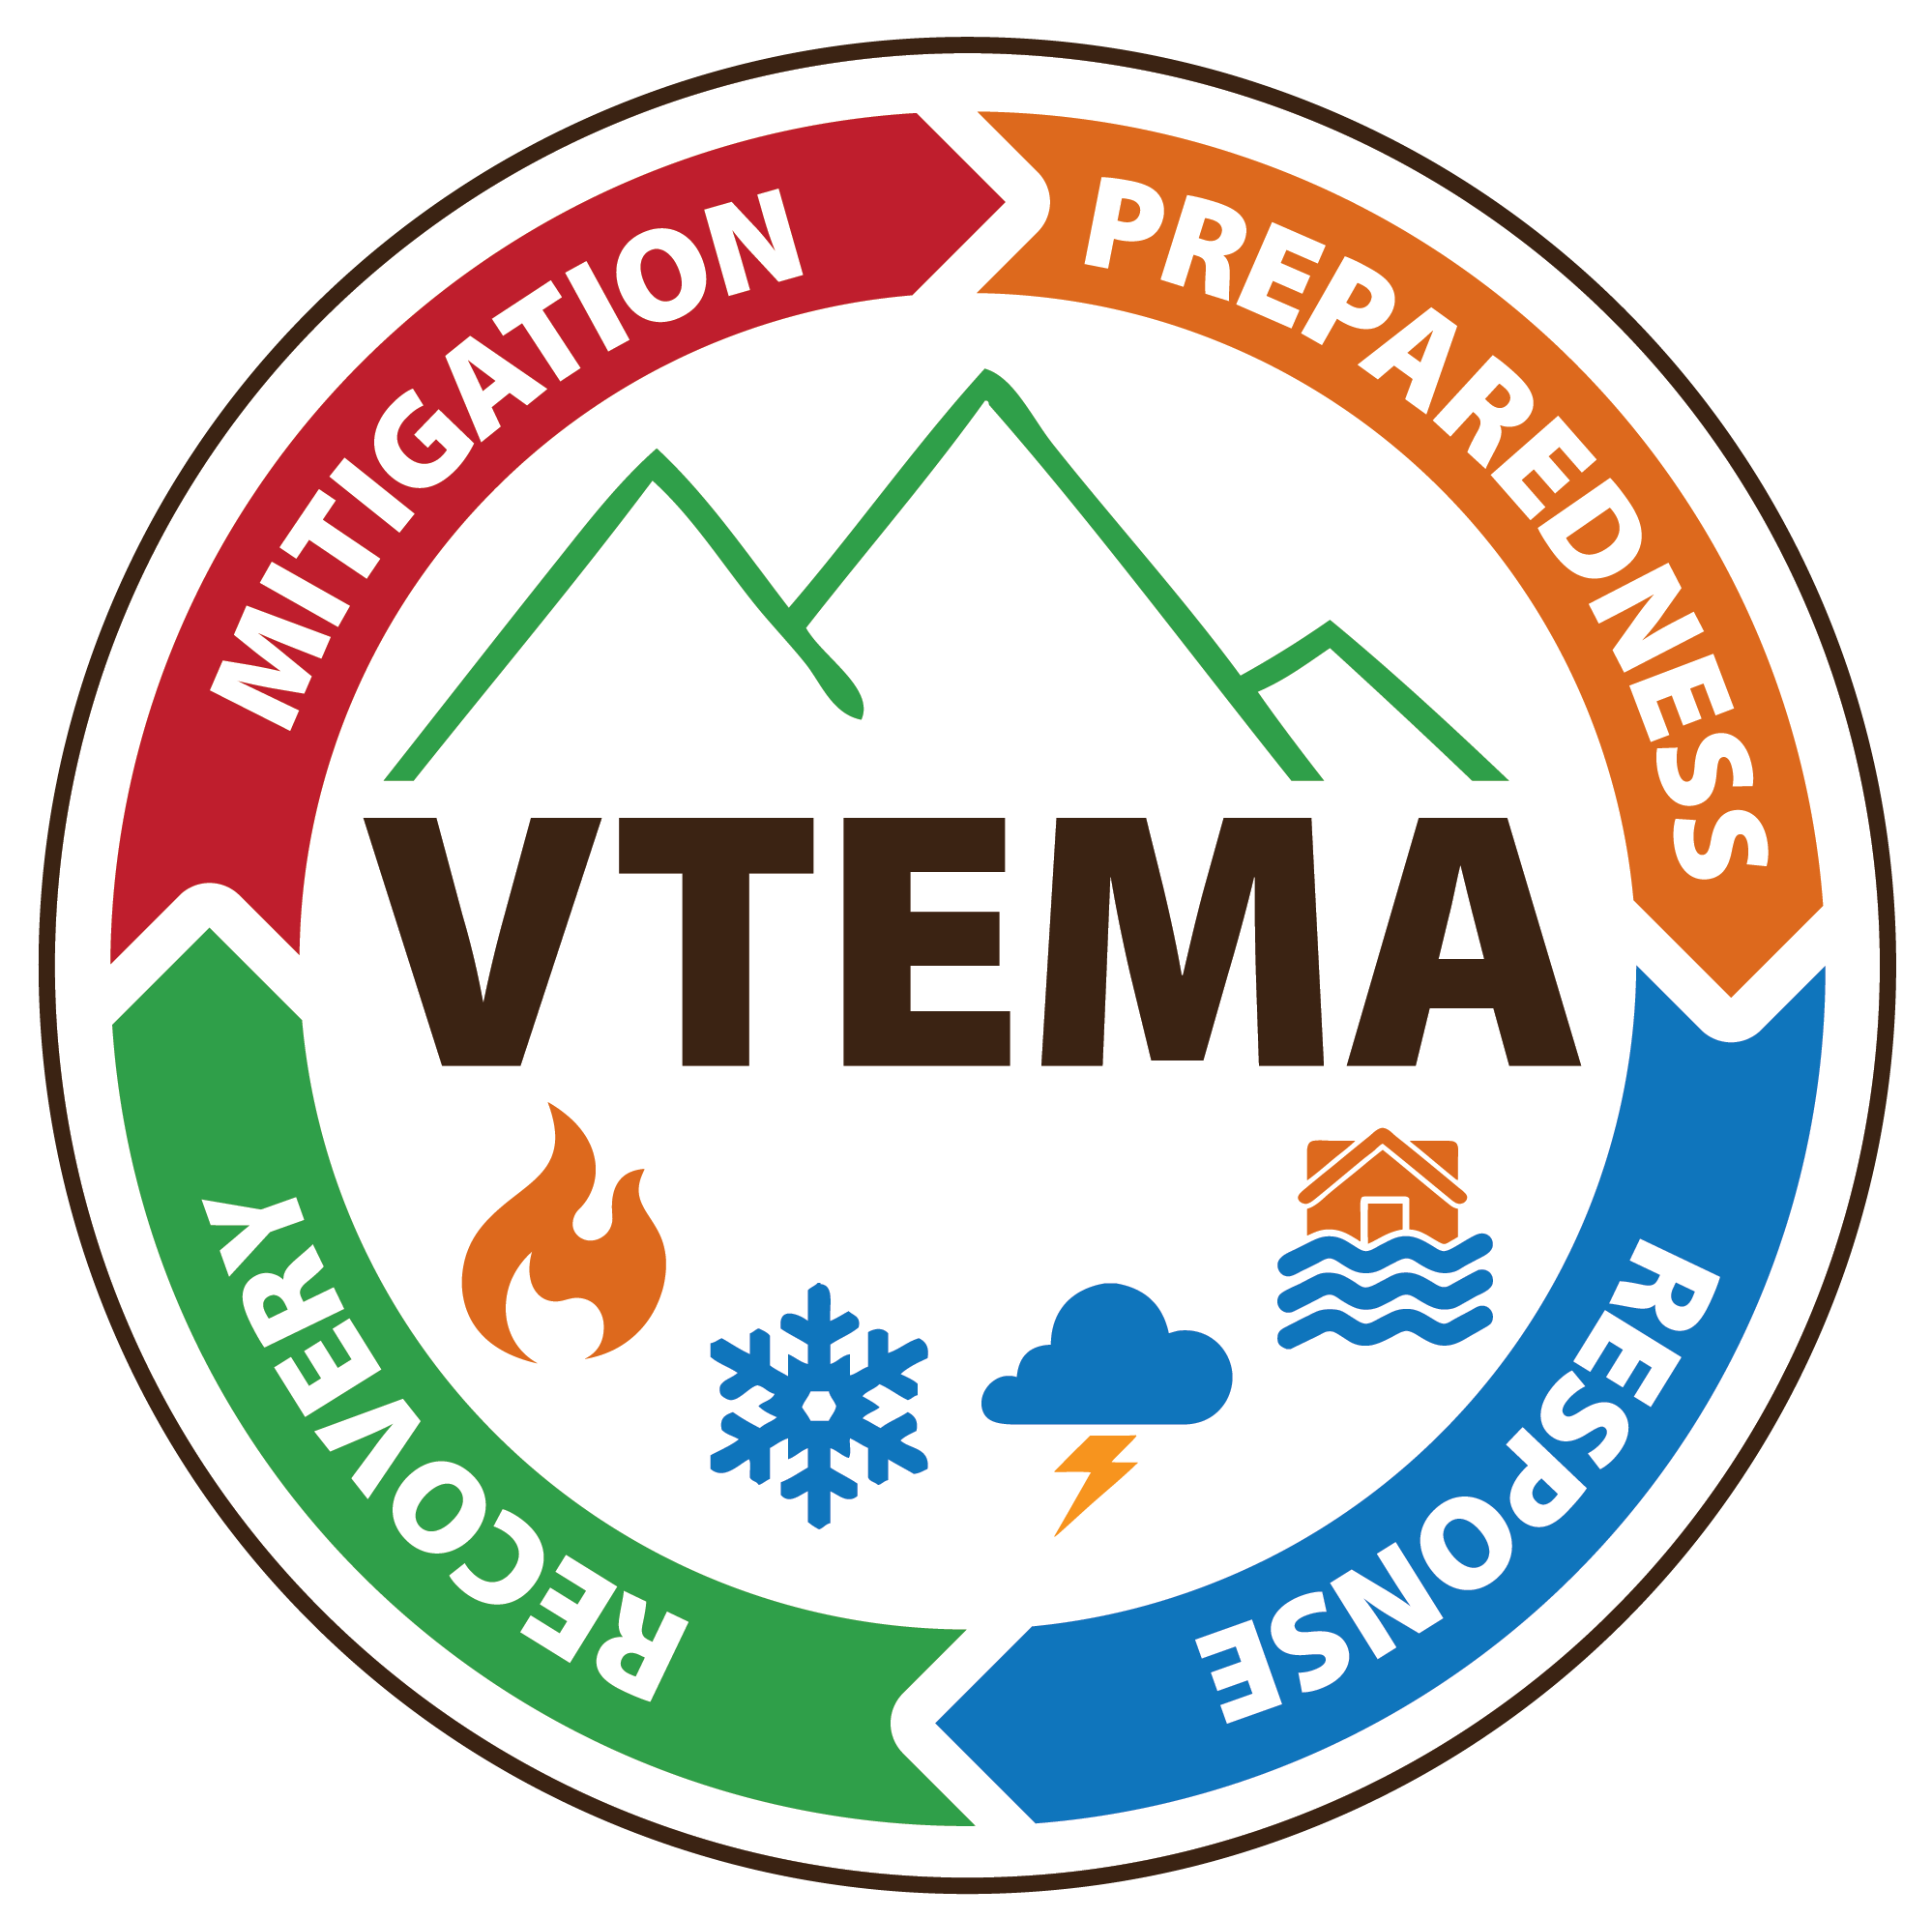 Vermont Emergency Management Association